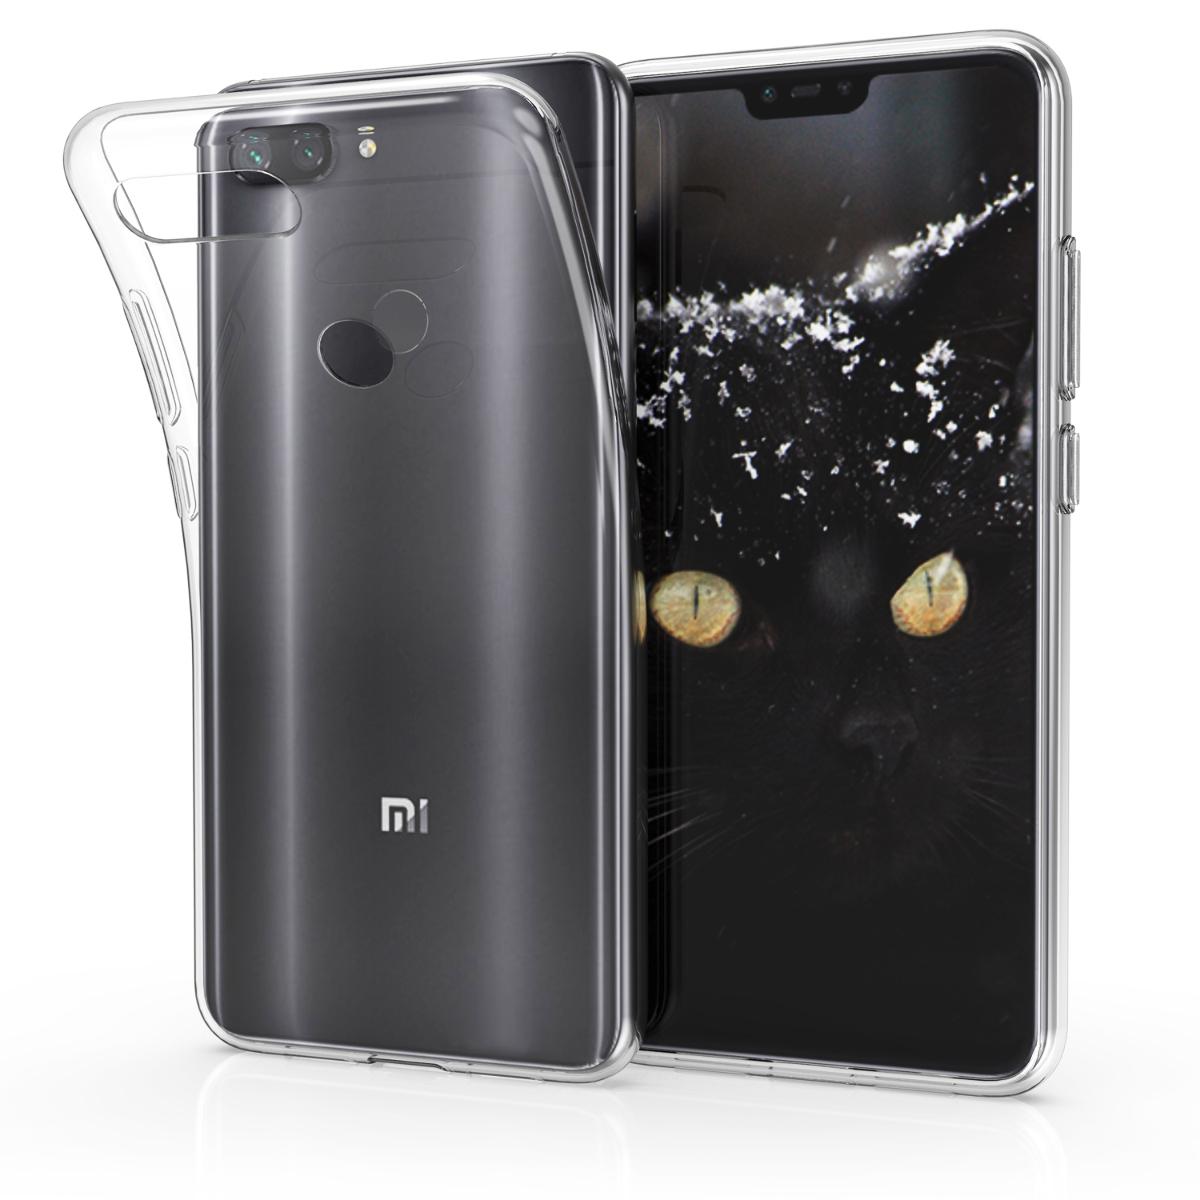 KW Θήκη Σιλικόνης Xiaomi Mi 8 Lite -Transparent (46450.03)